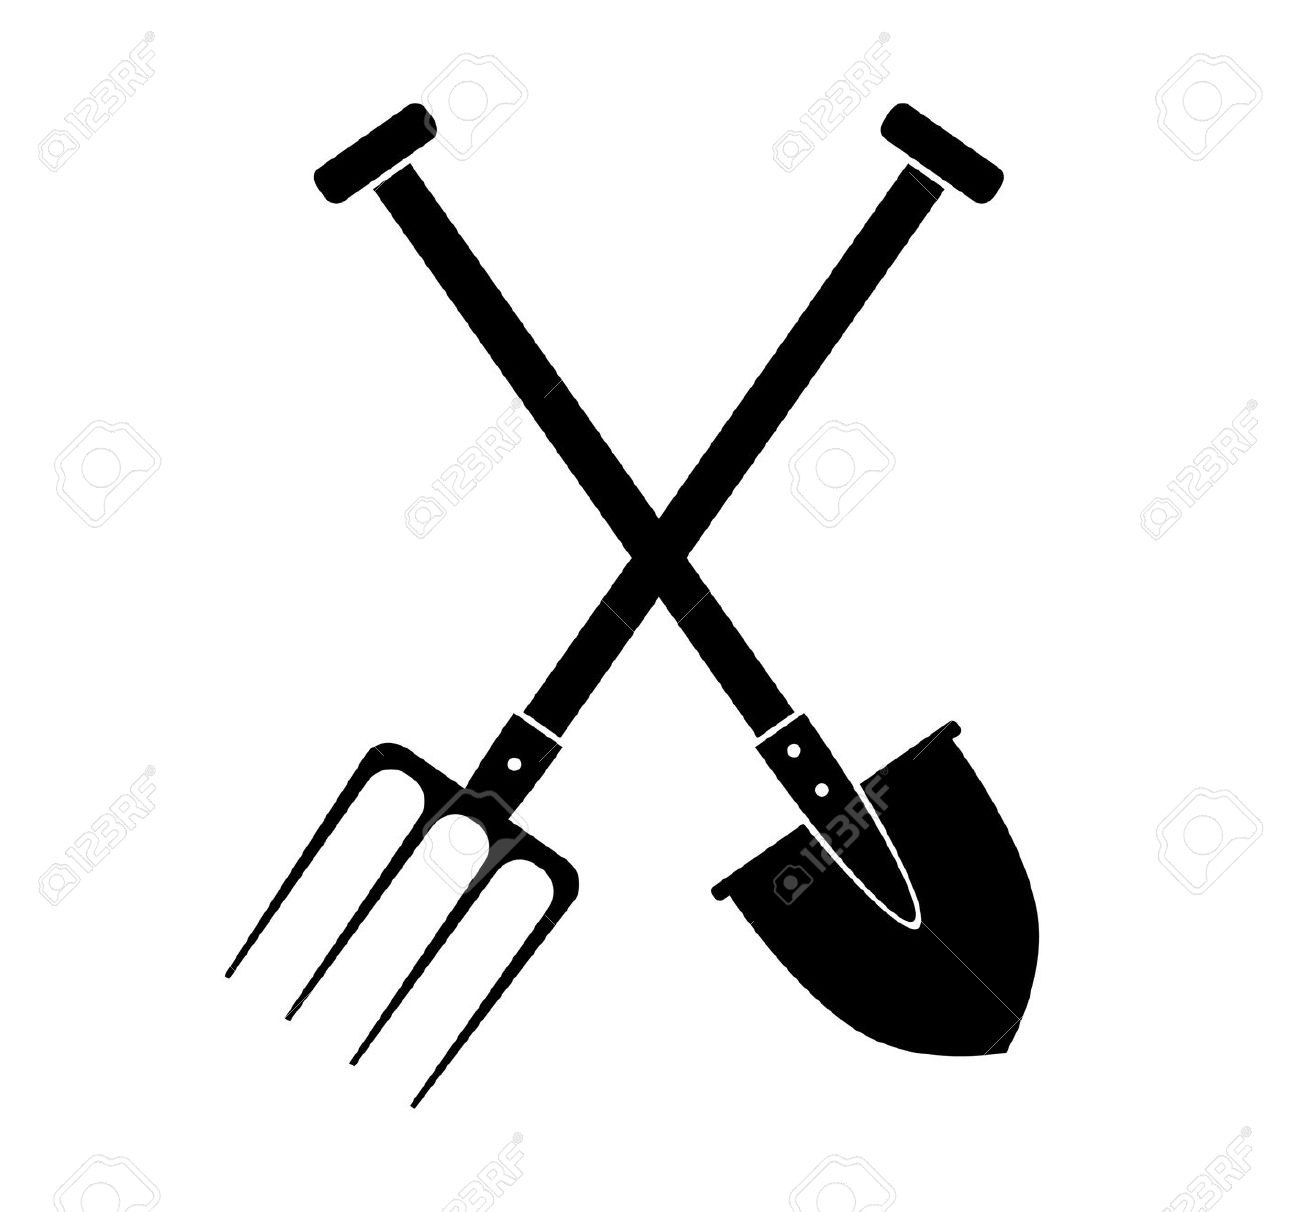 Shovel in black background clipart.